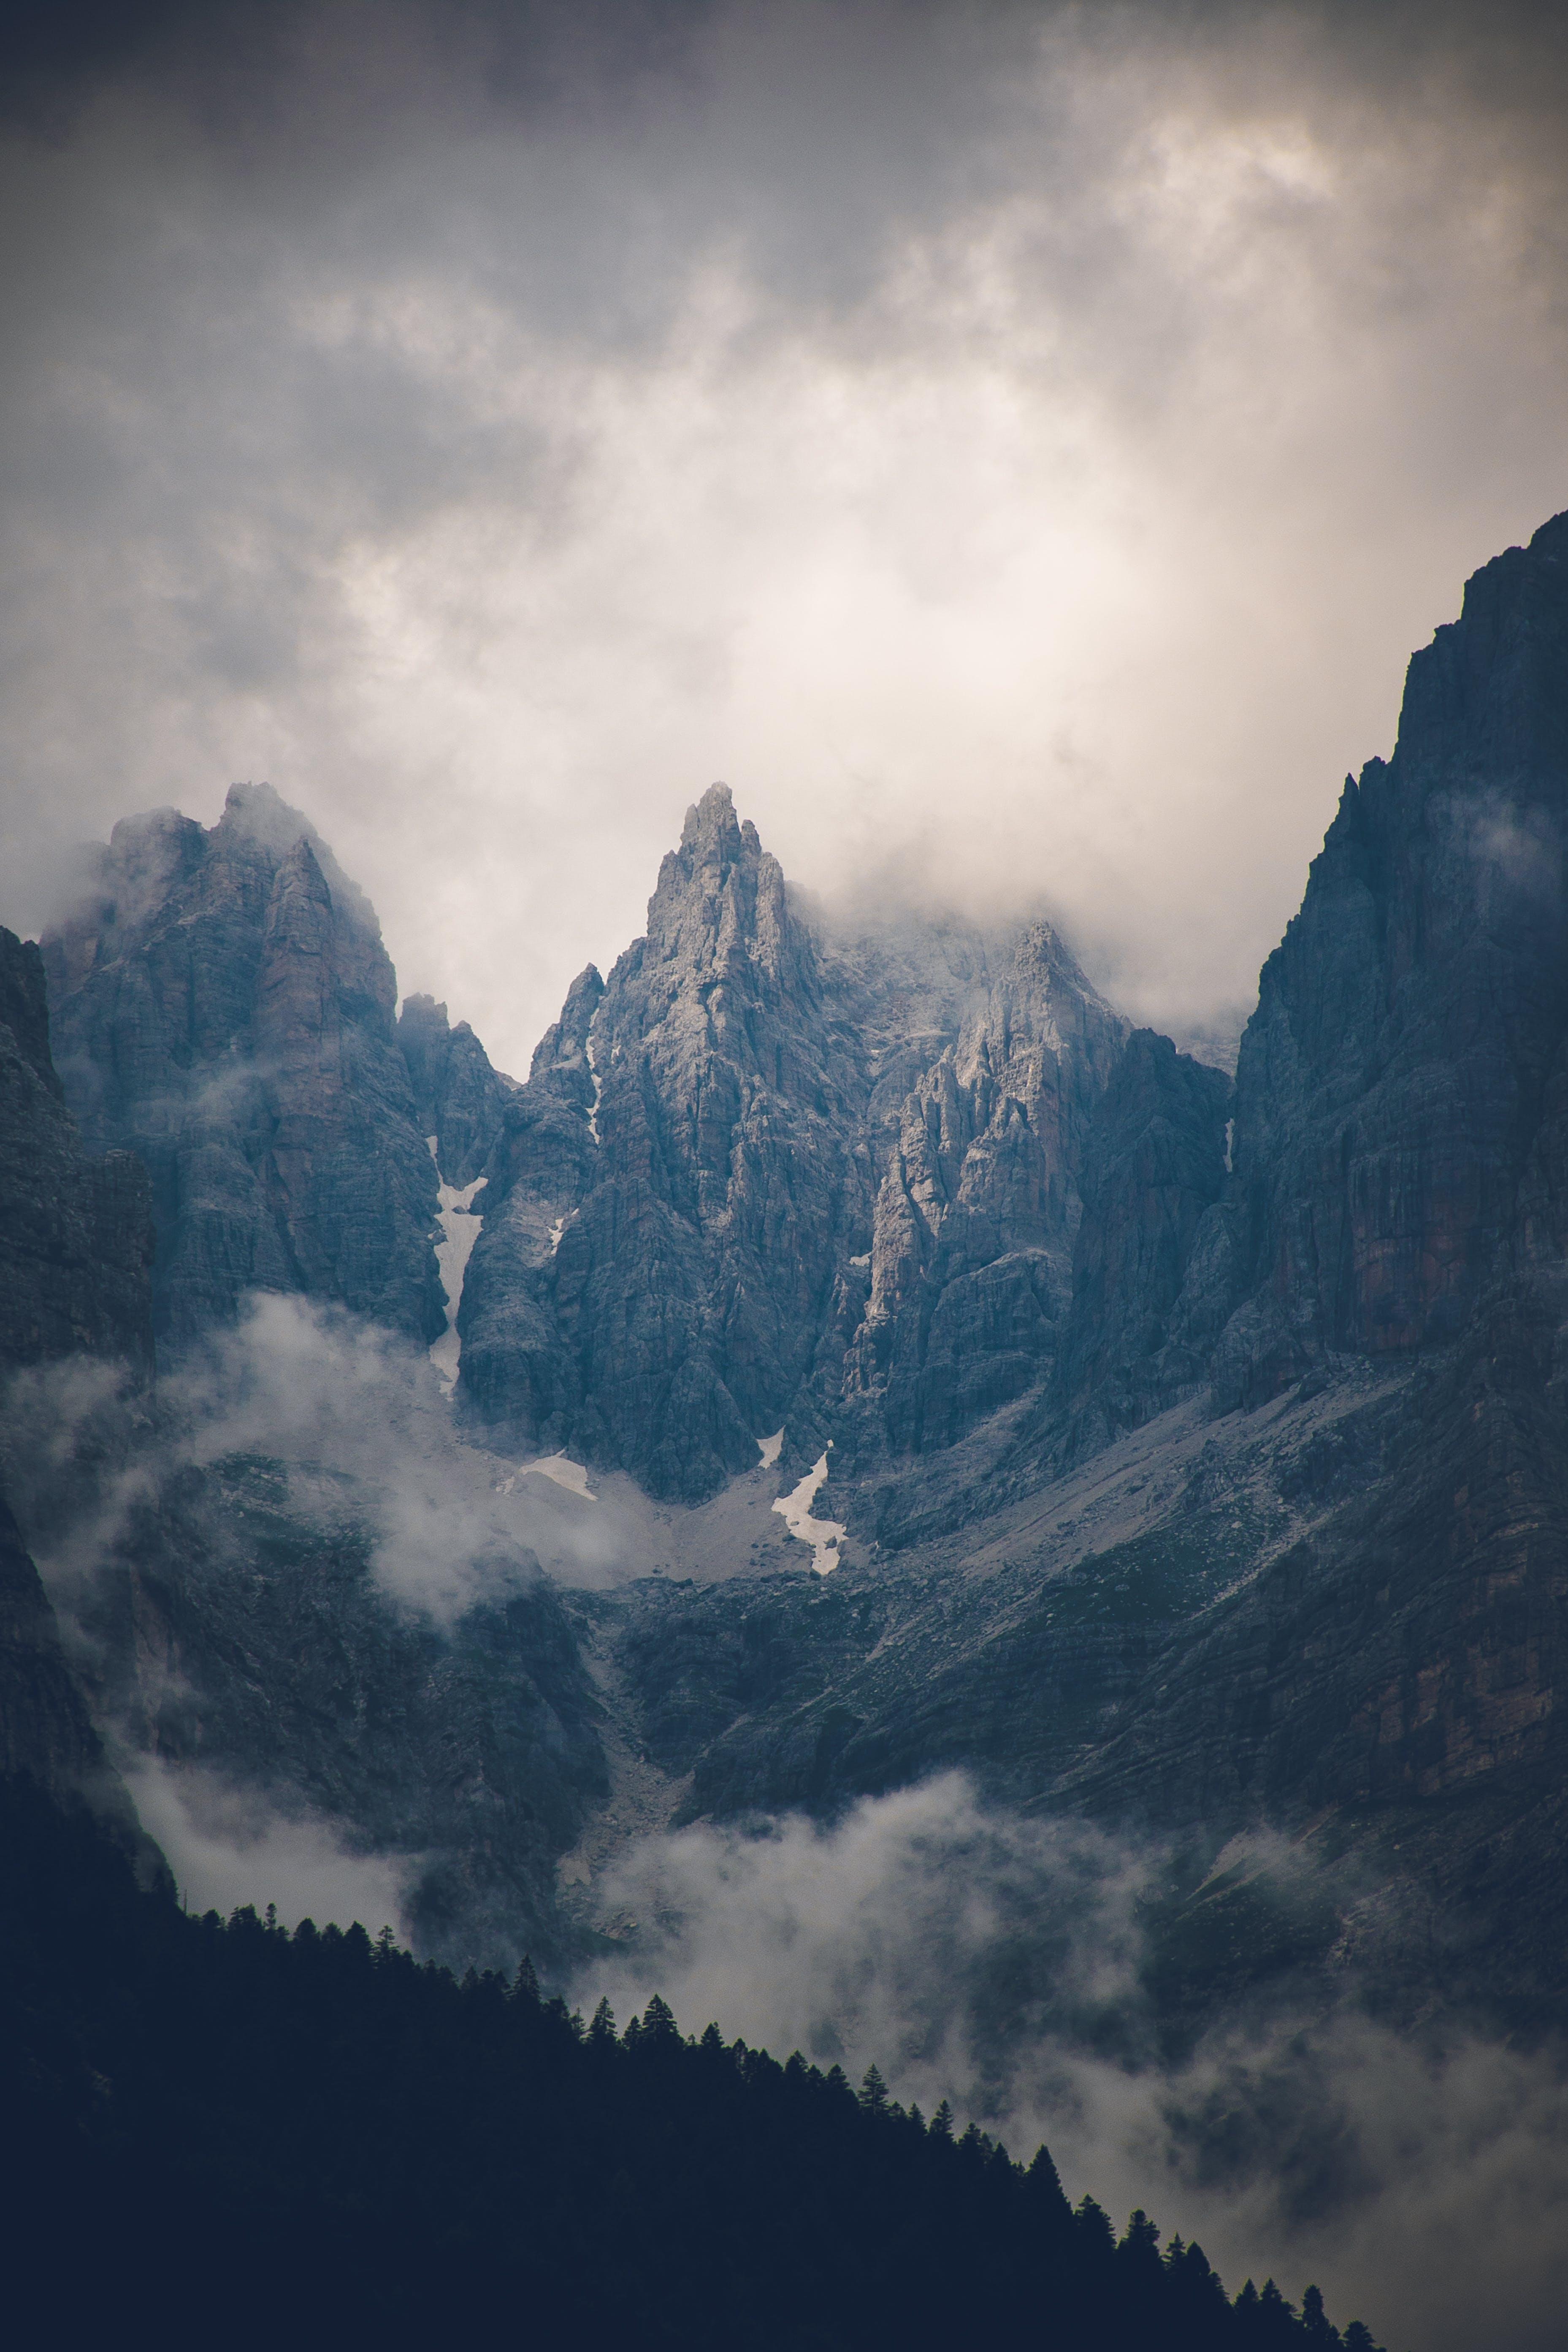 Mountain Under Cloudy Sky